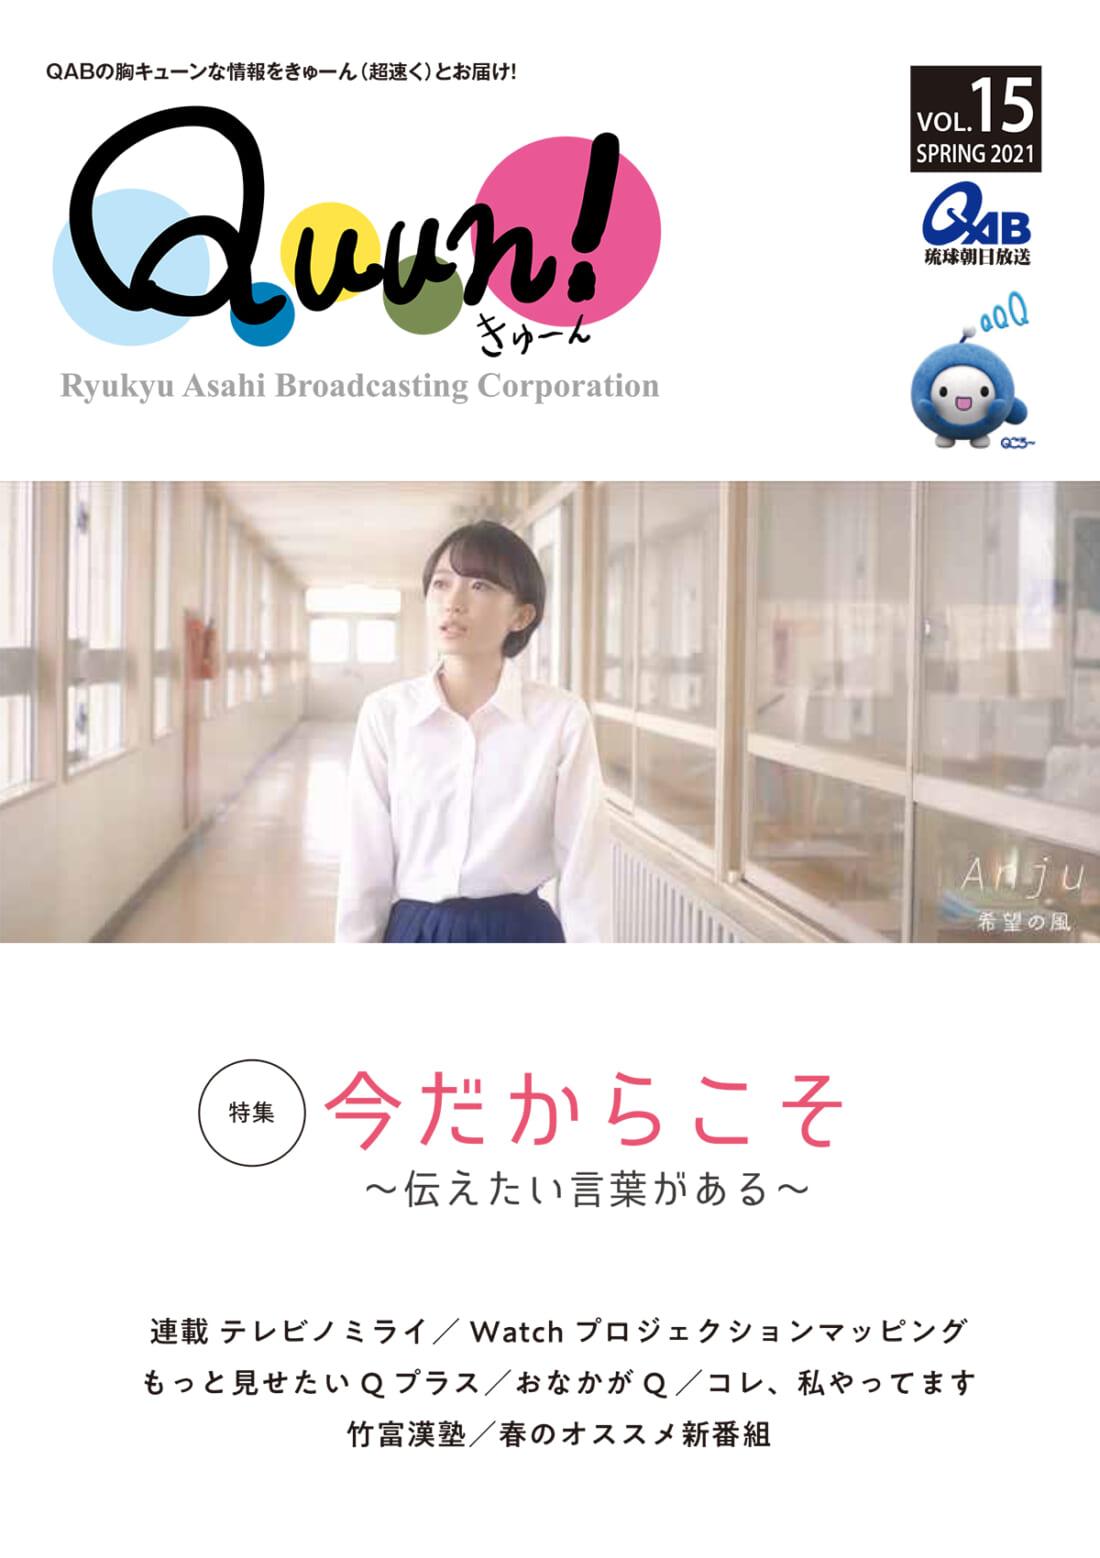 https://www.qab.co.jp/qgoro/wp-content/uploads/quun_1501-1100x1558.jpg